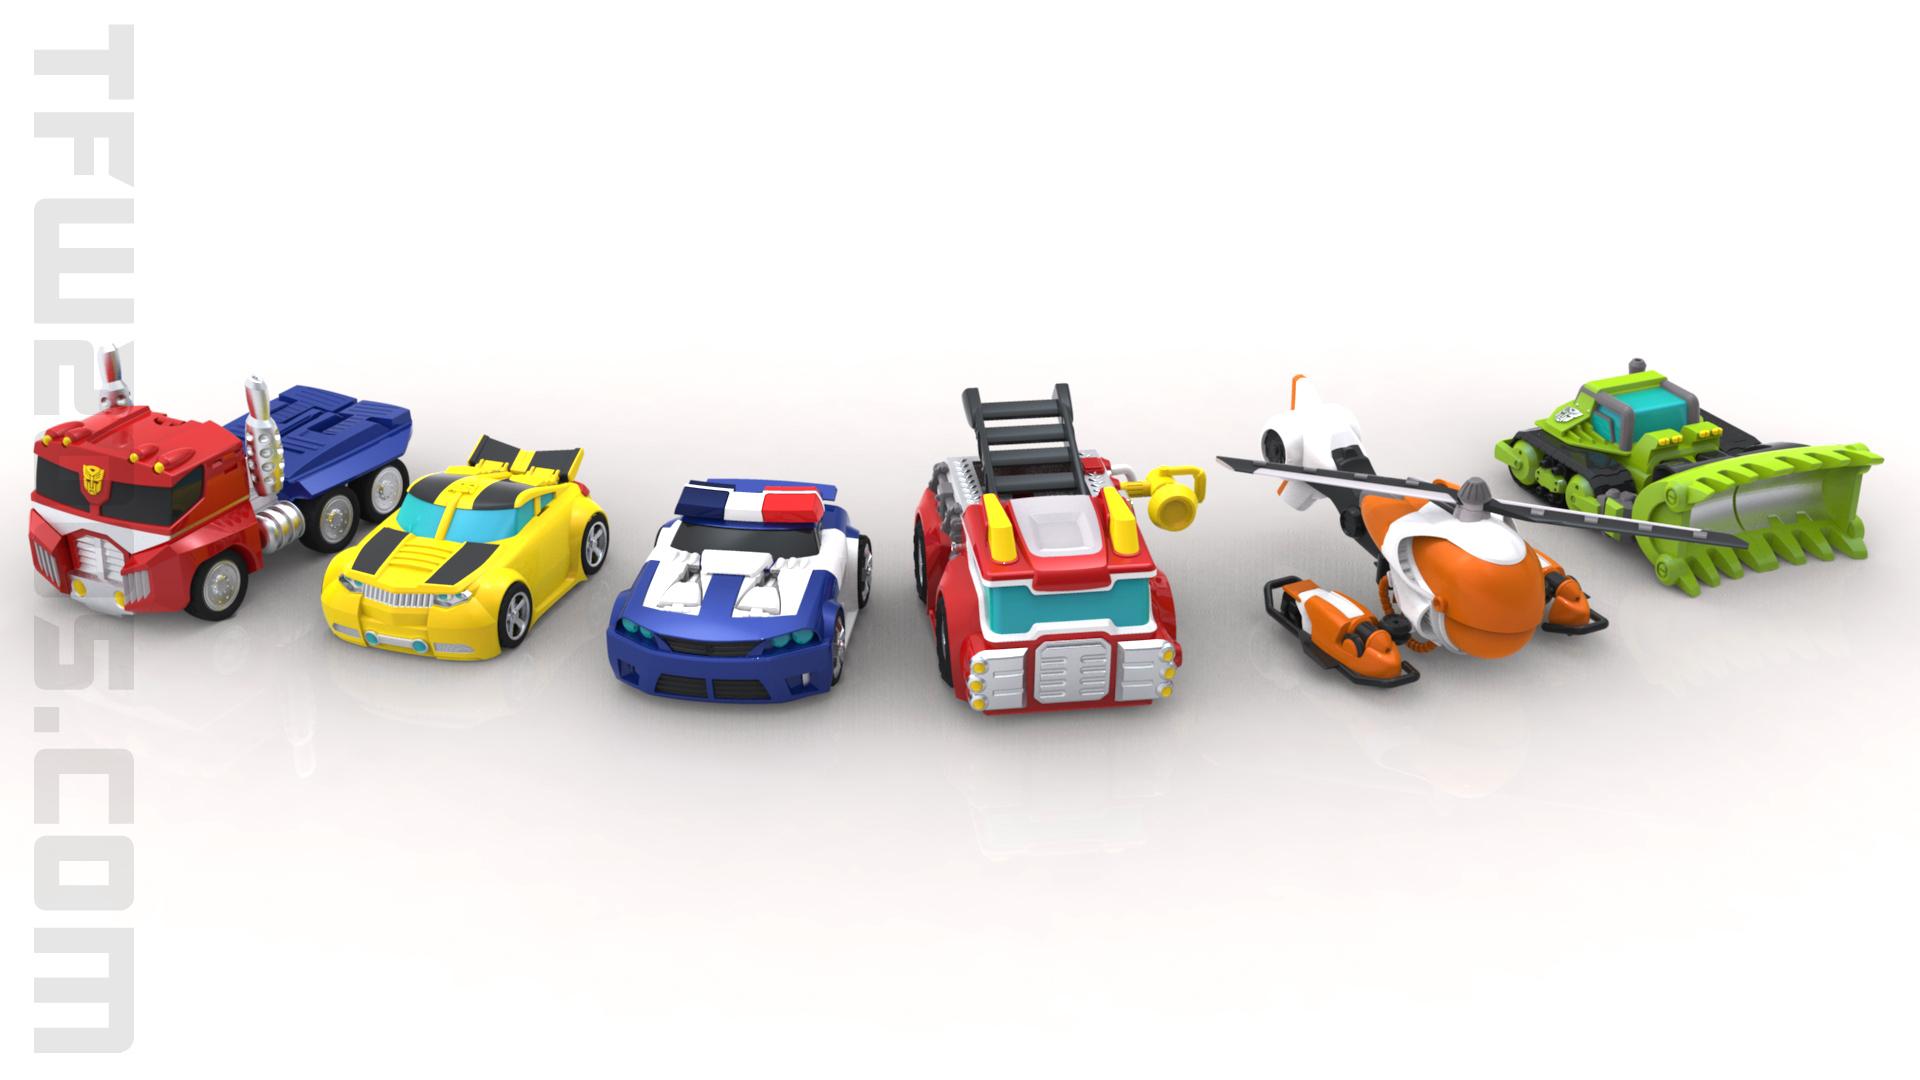 Transformers Rescue Bots Concept Art 6